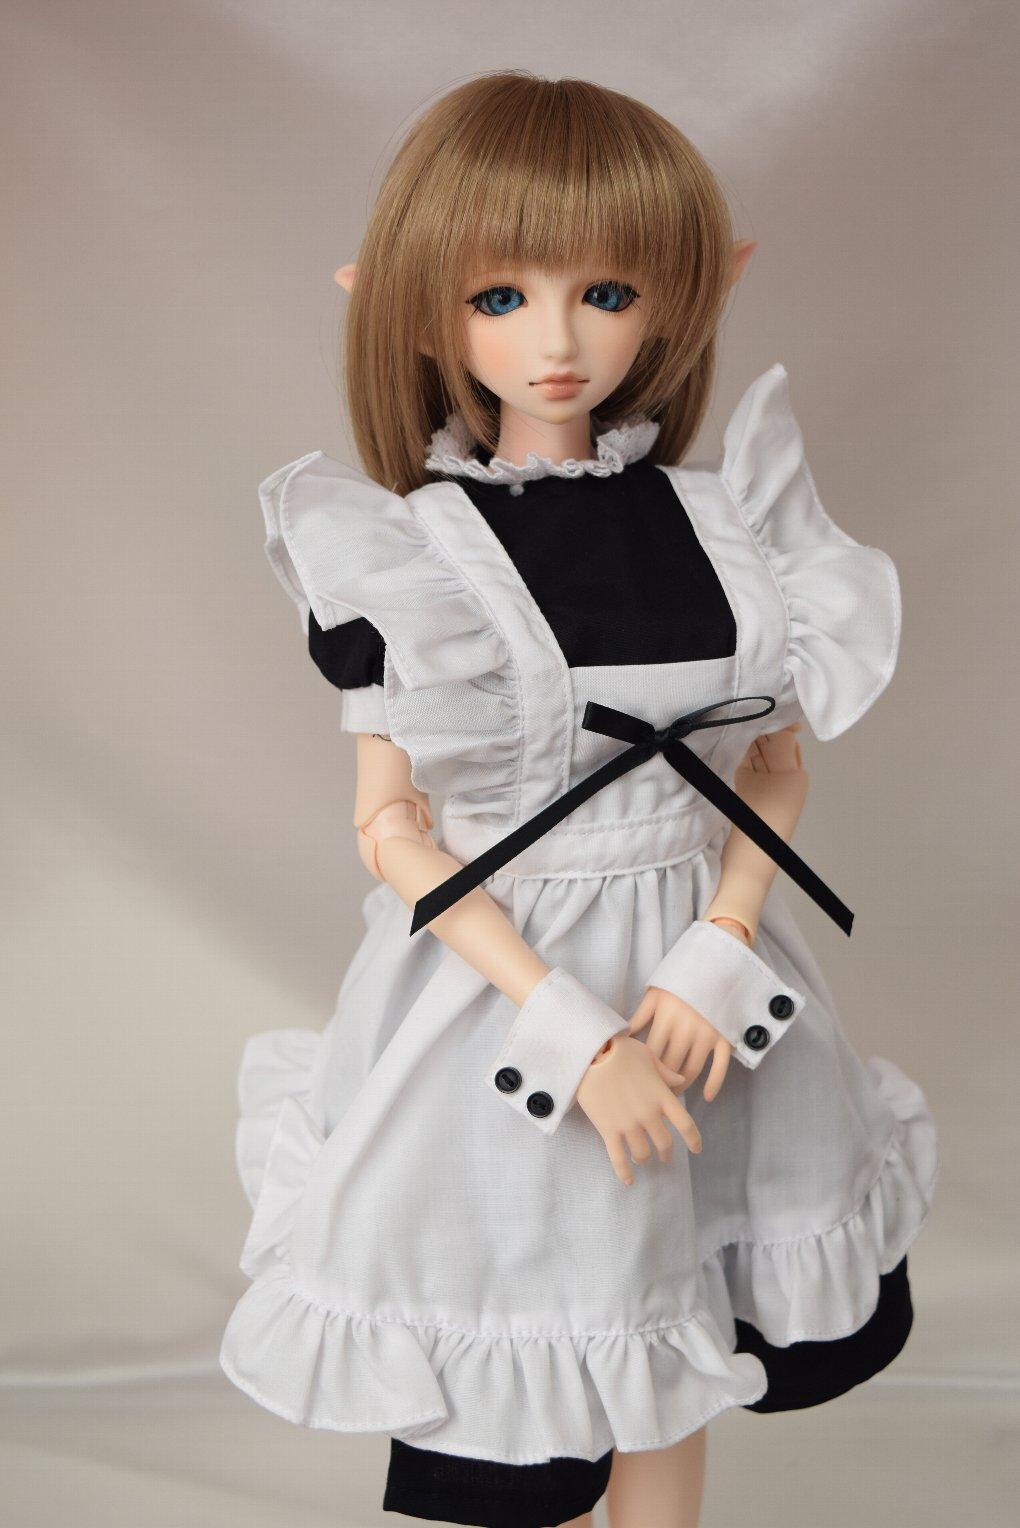 doll_3717.jpg